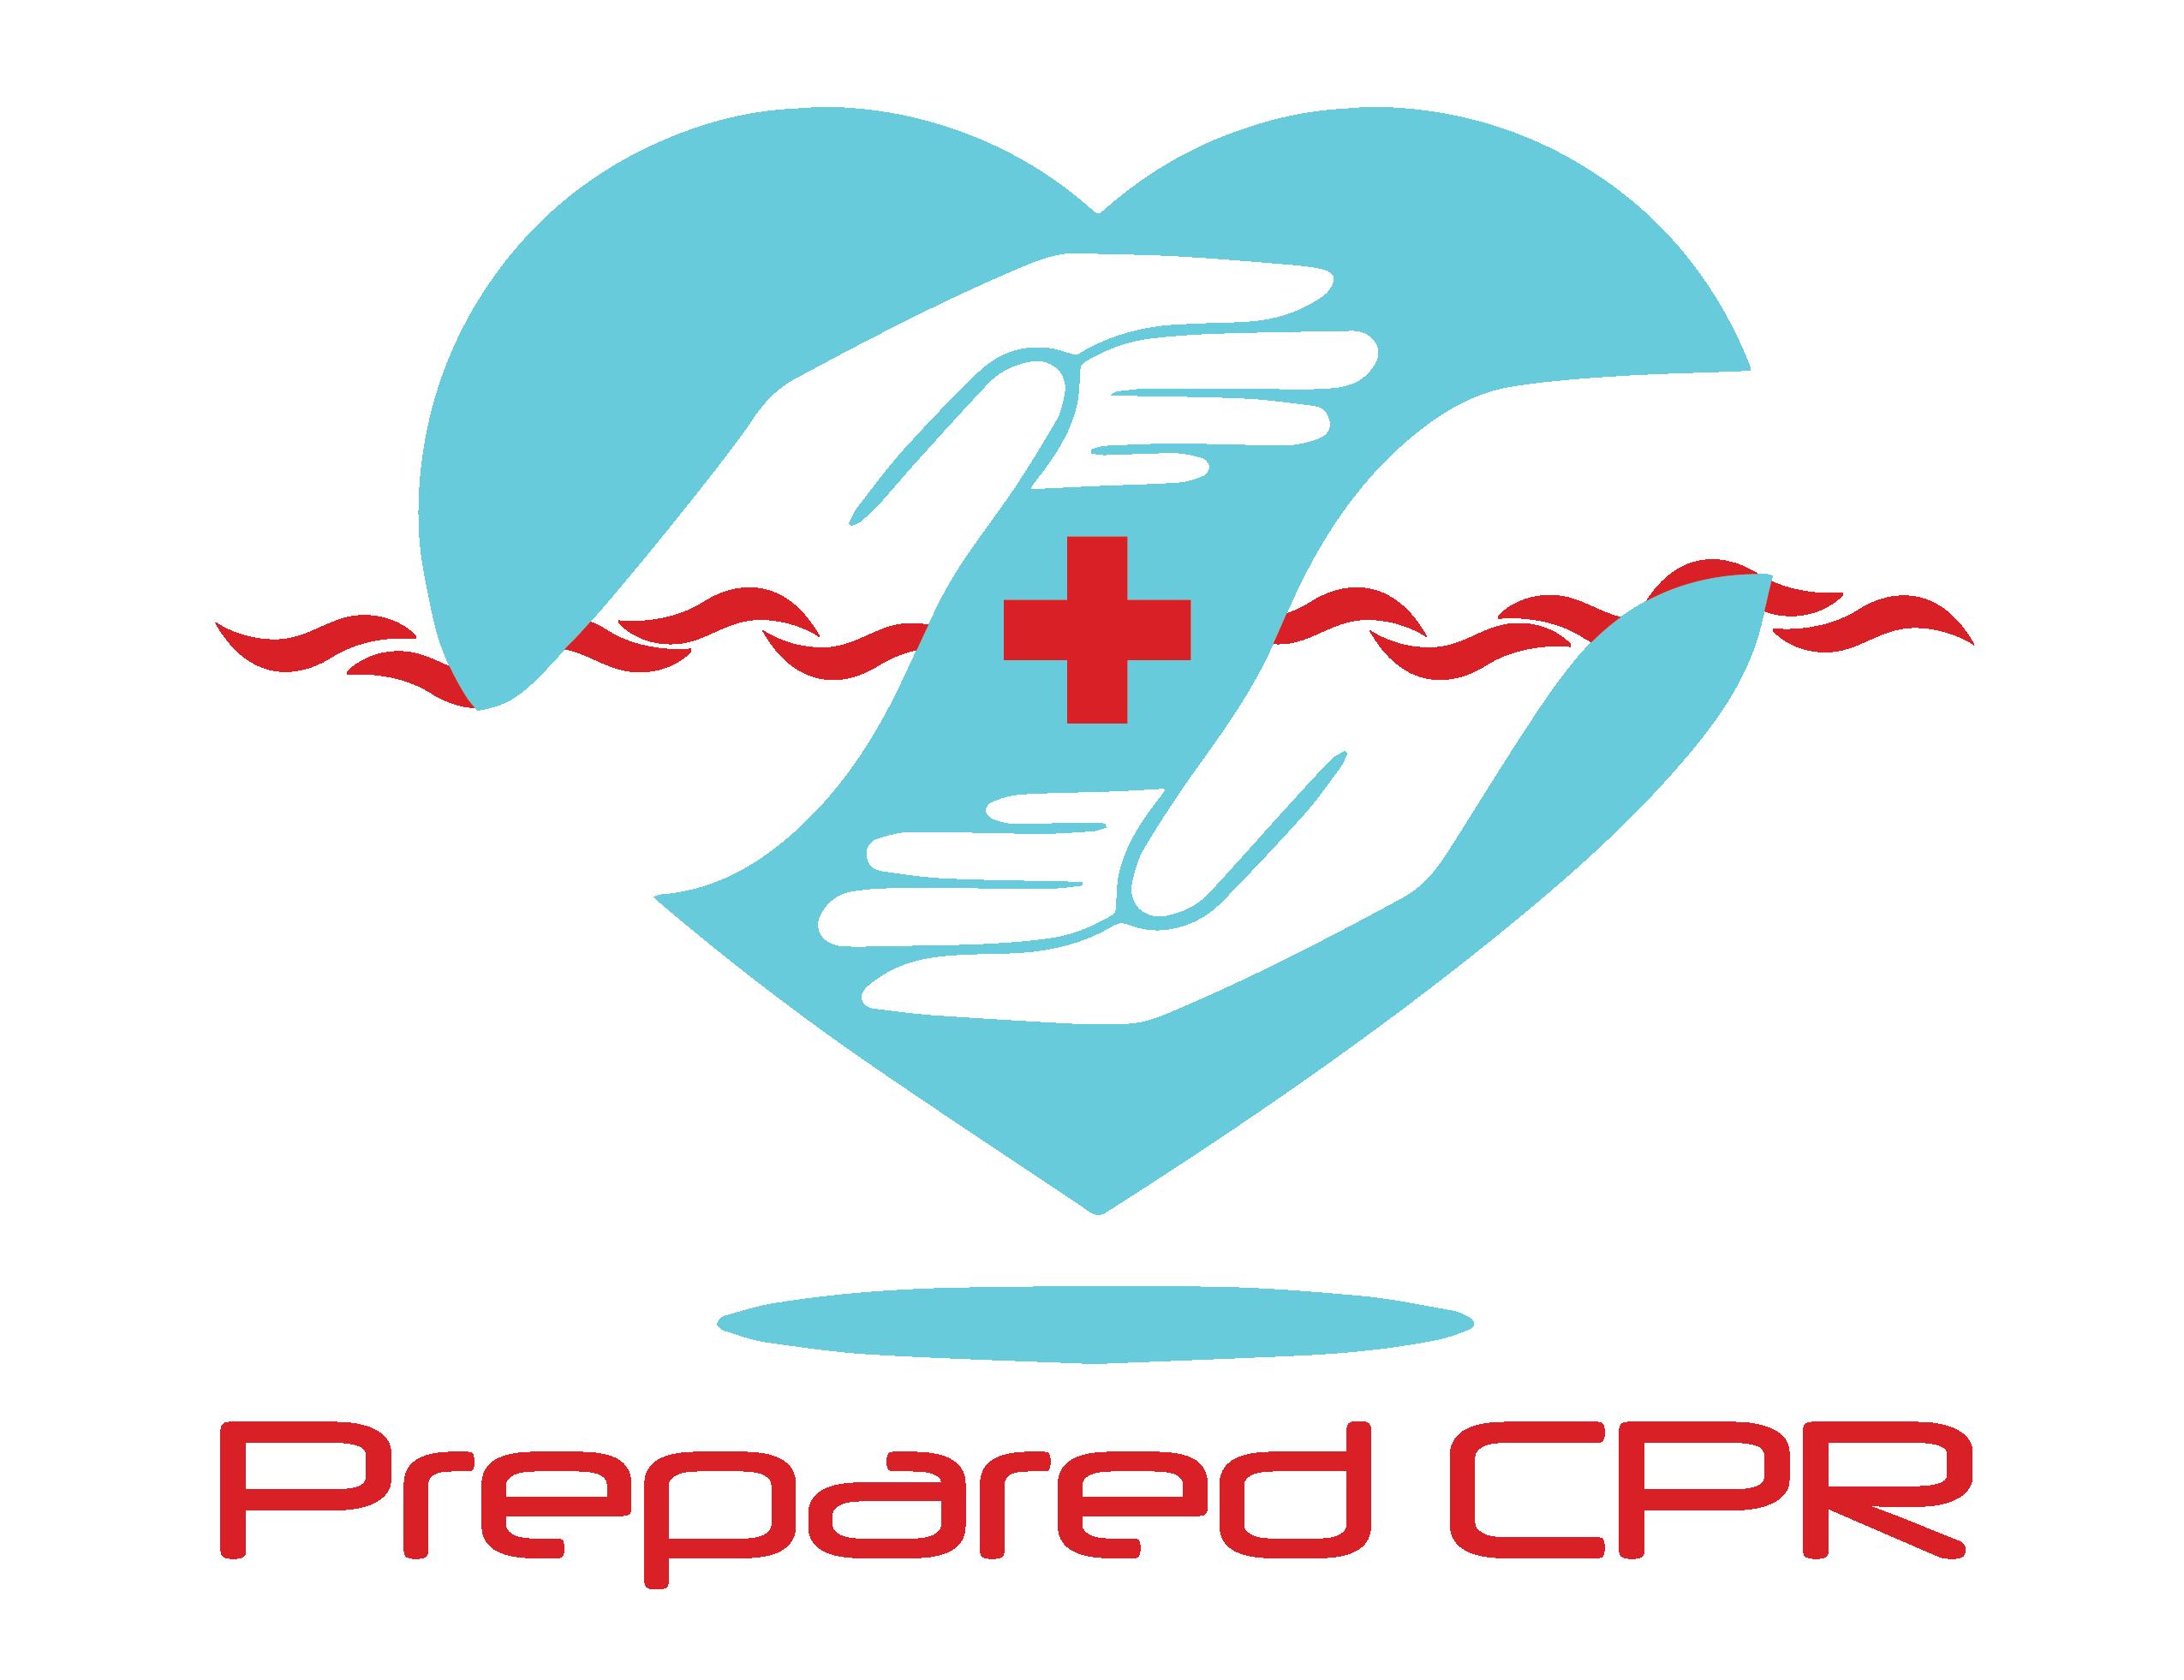 Prepared Emsprepared Cpr Is Exhibiting At Orange Countys Largest